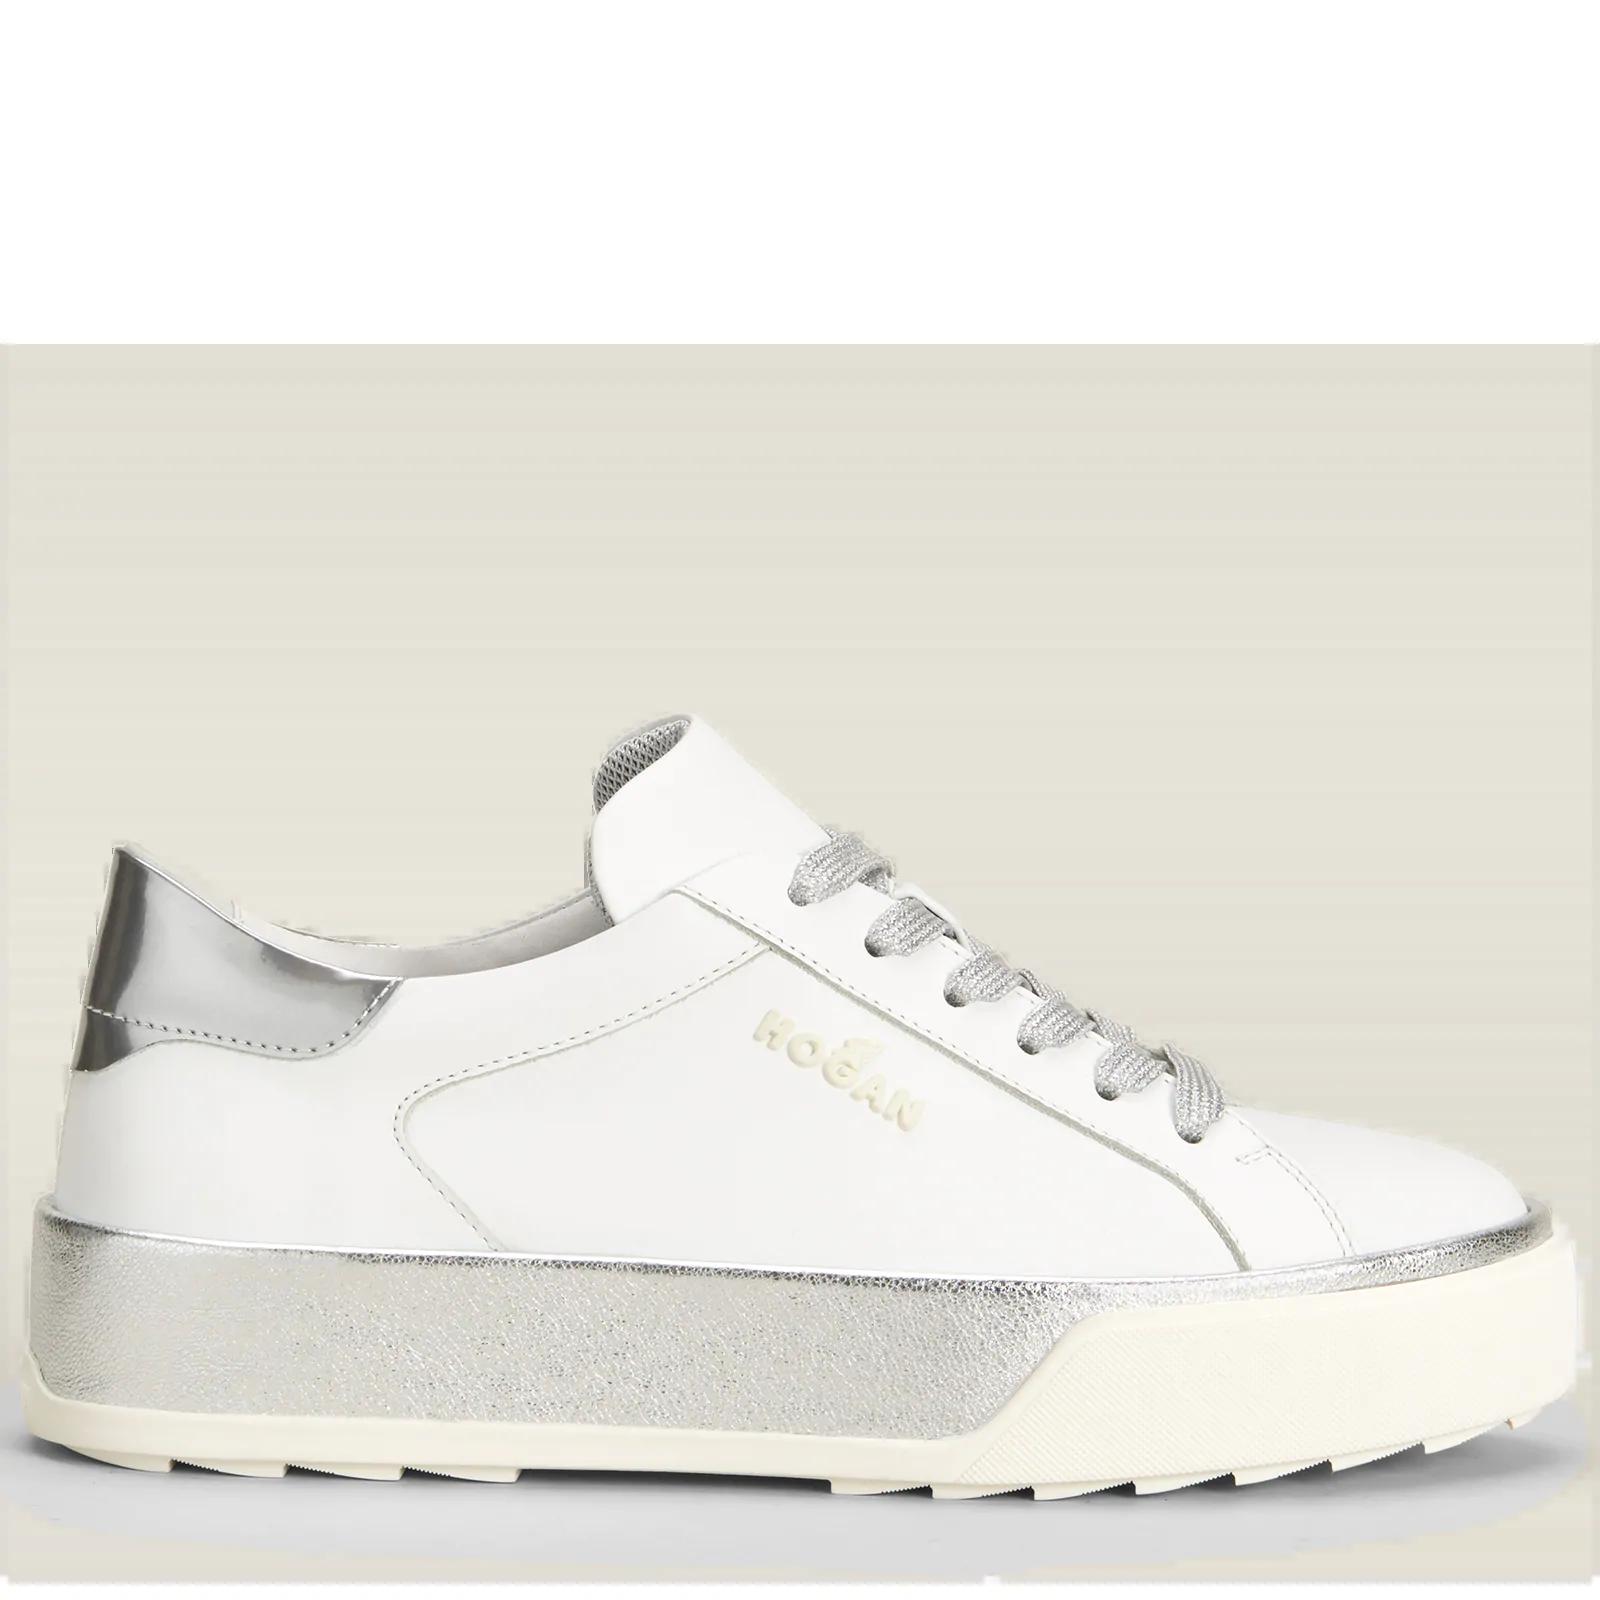 Hogan - Sneakers - H320 In Silber,weiss | ModeSens